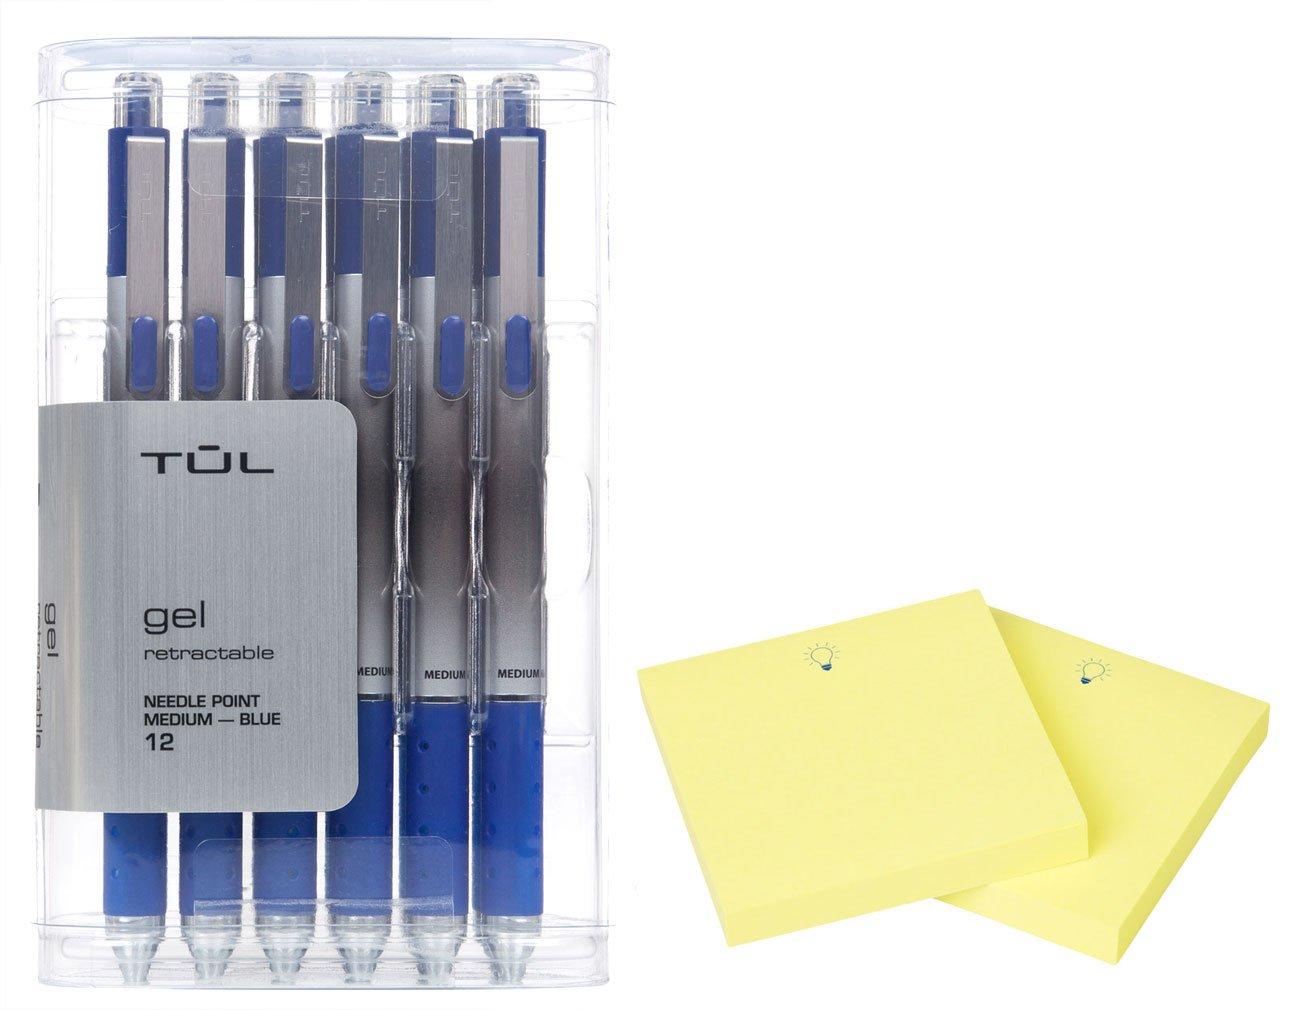 TUL GL1 Gel Pen Retractable Needle Point Medium 0.7mm, Blue 12/pk + ''IdeaPad'' Post-It Notes (200-ct) Bundle by TUL (Image #1)